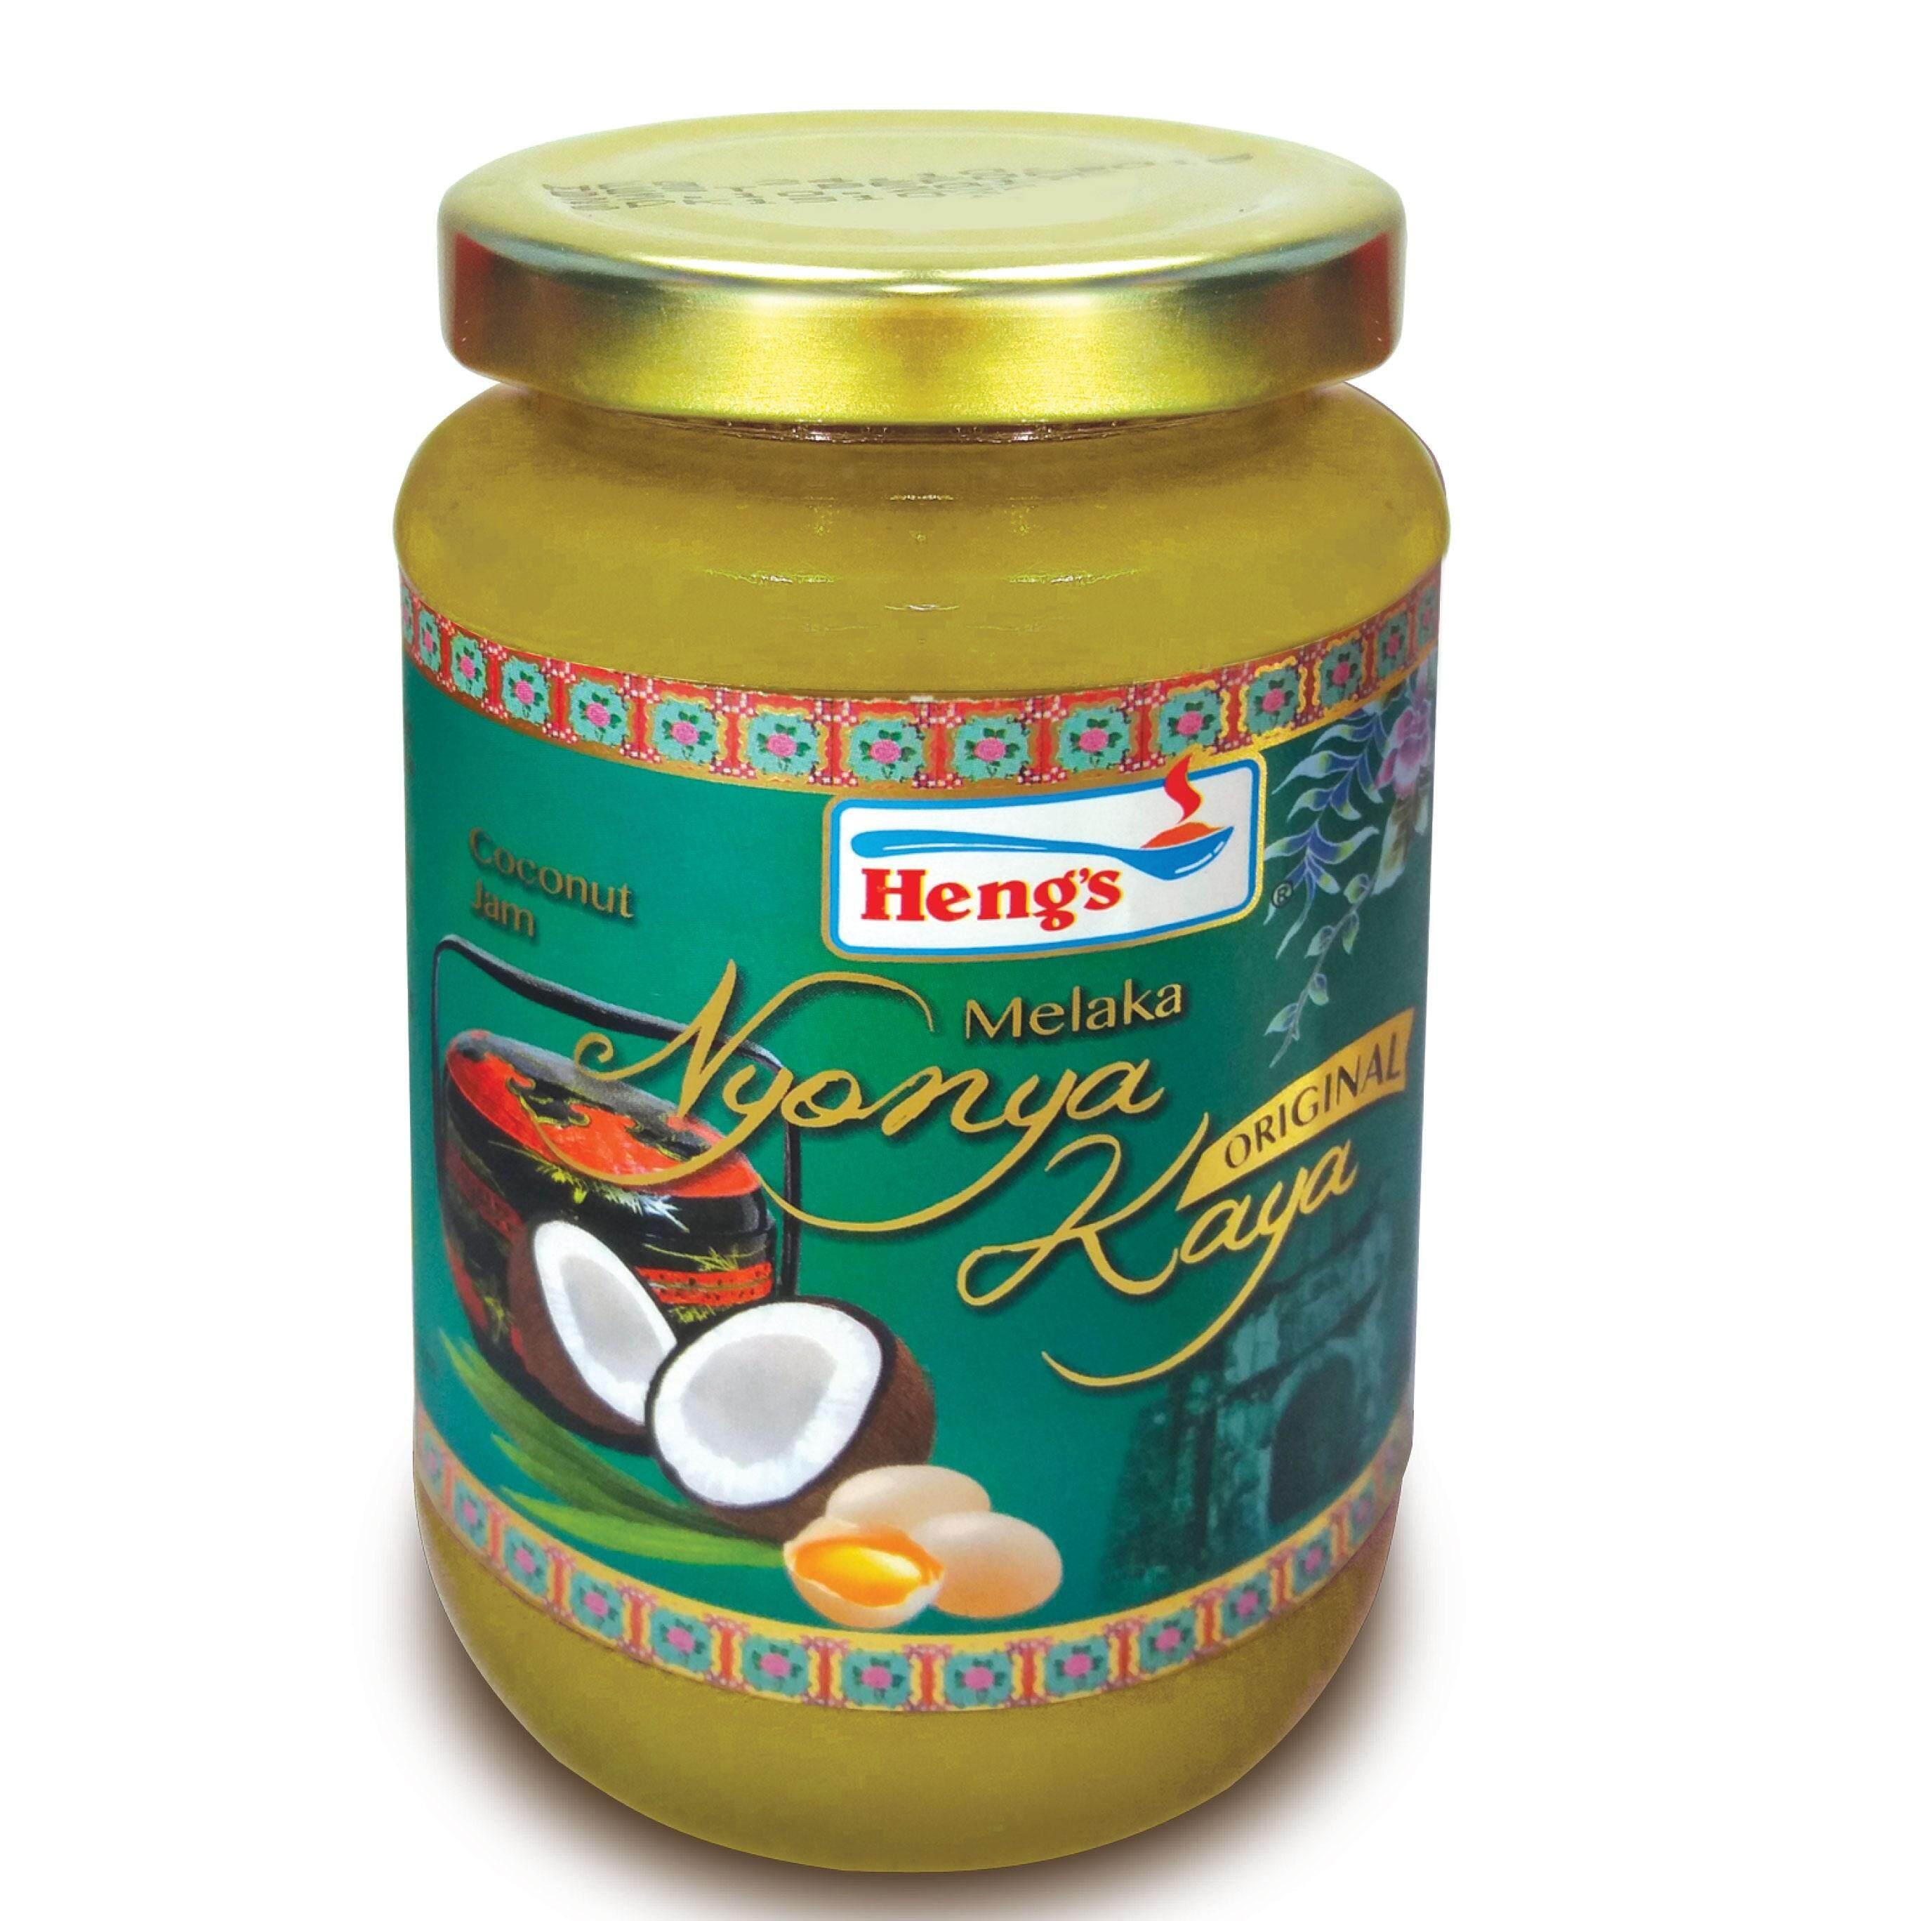 Heng's Nyonya Original Kaya